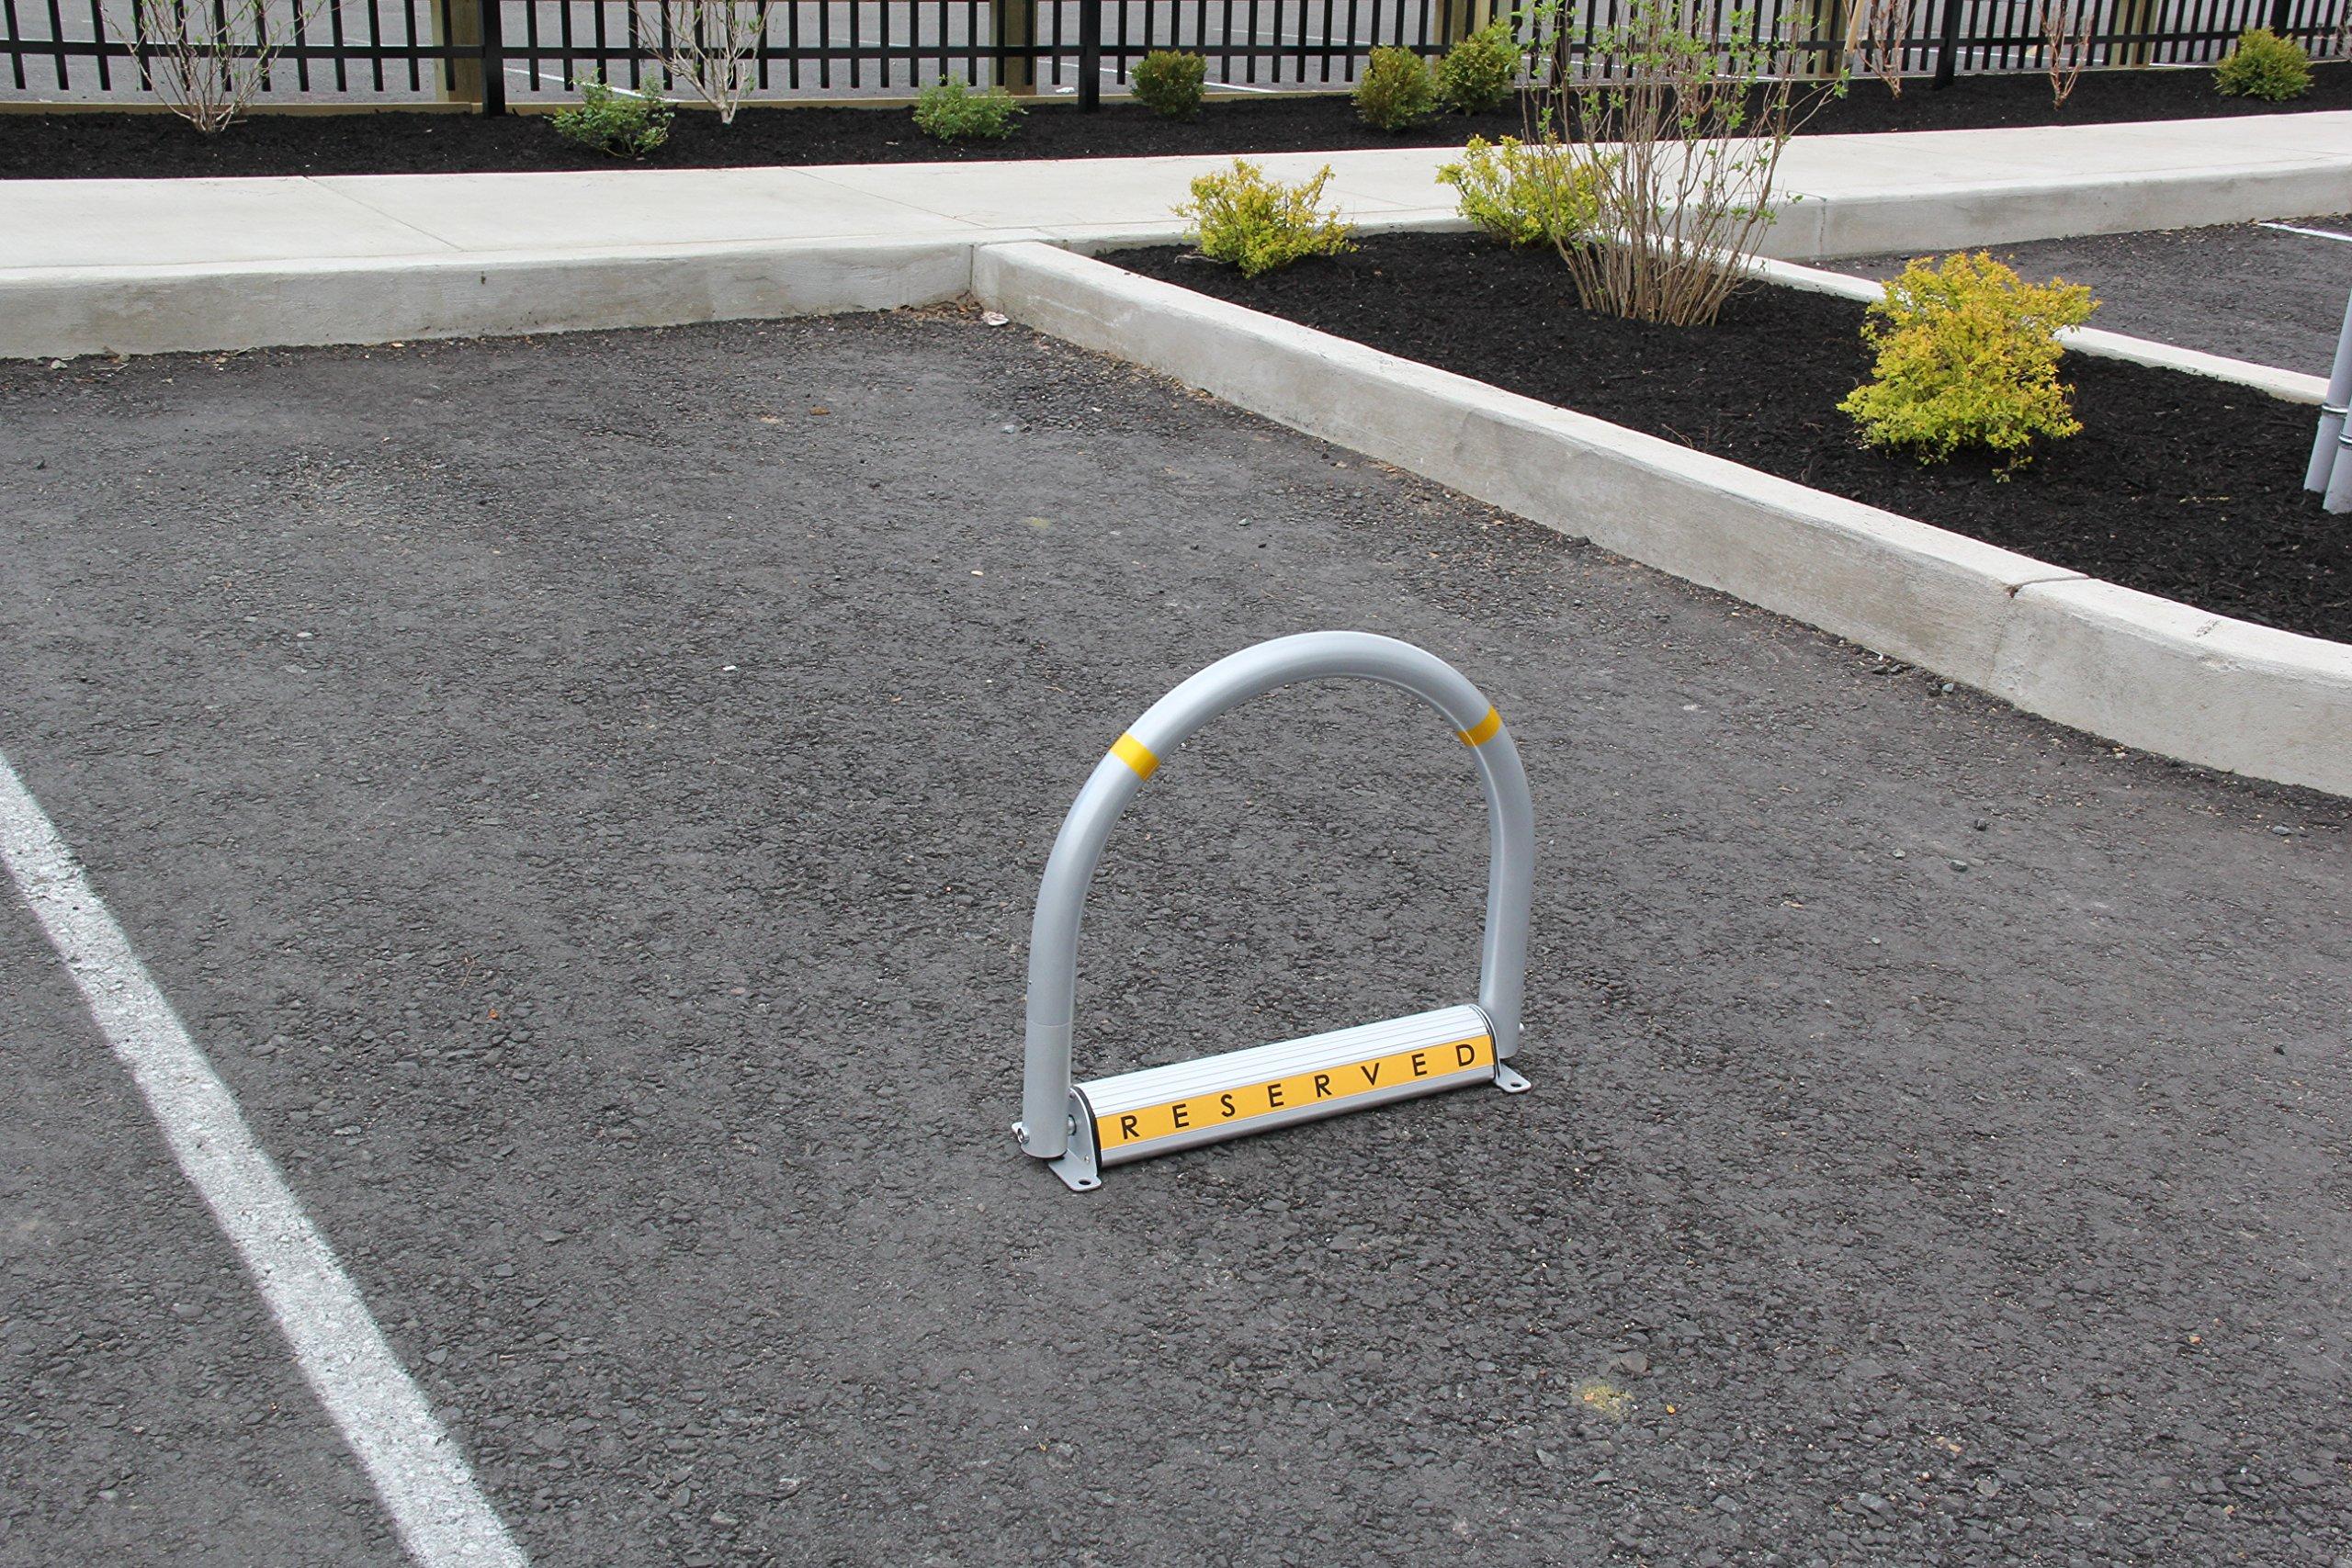 MySpot 500 Remote Controlled Parking Barrier by MySpot 500 (Image #2)